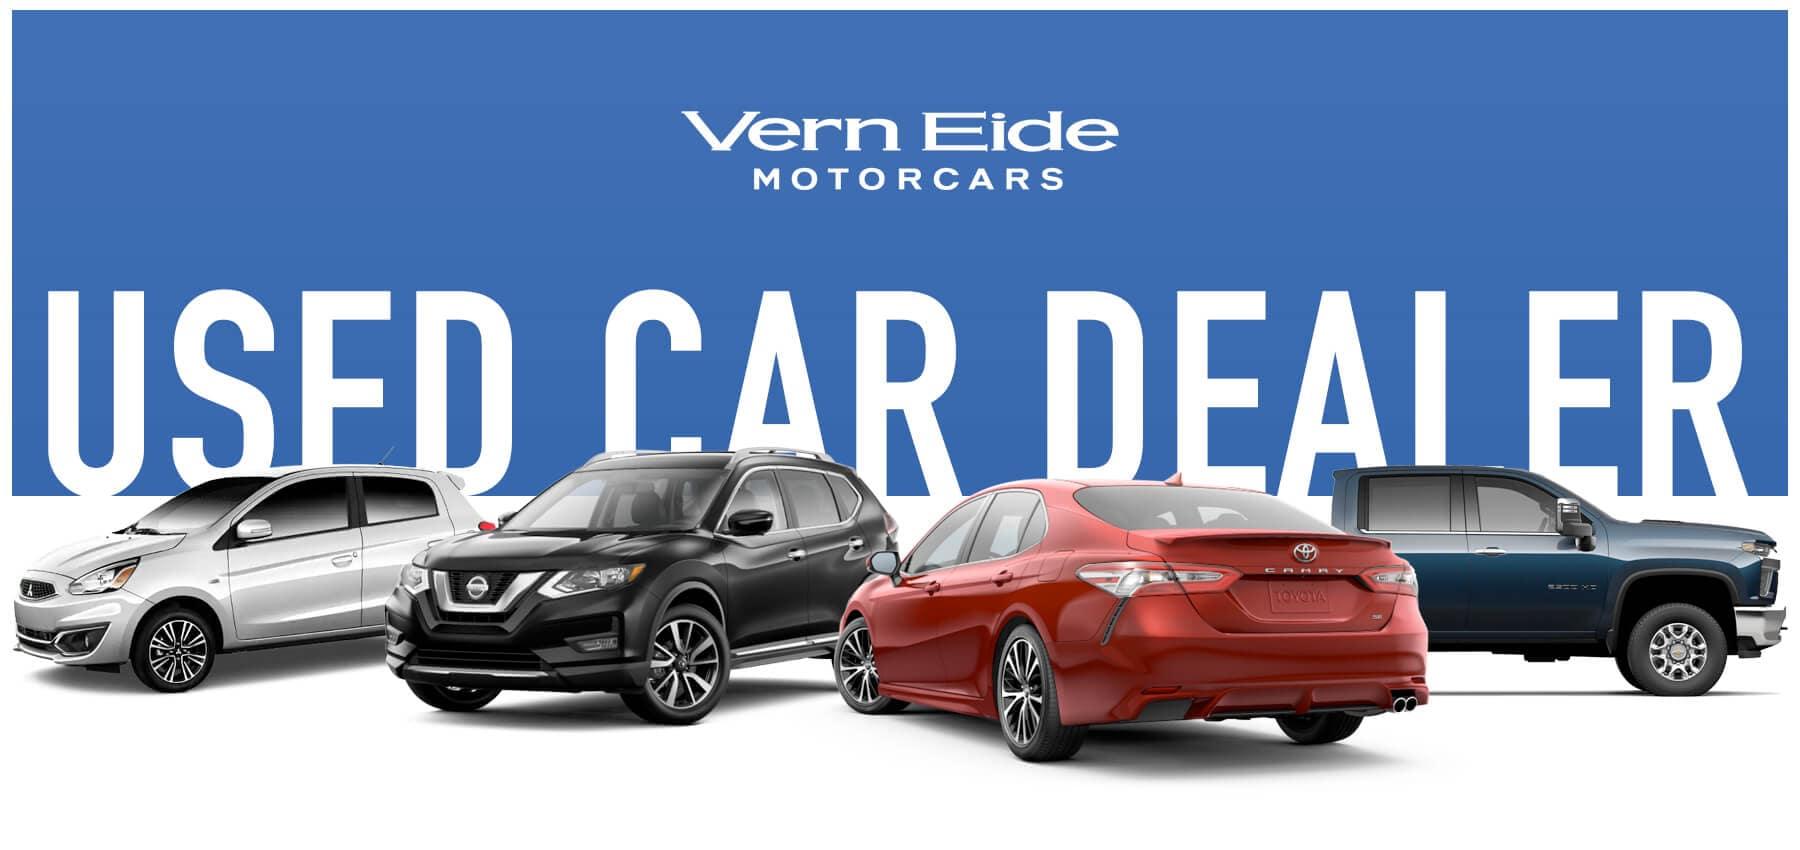 Vern Eide Motorcars Used Car Dealer Button